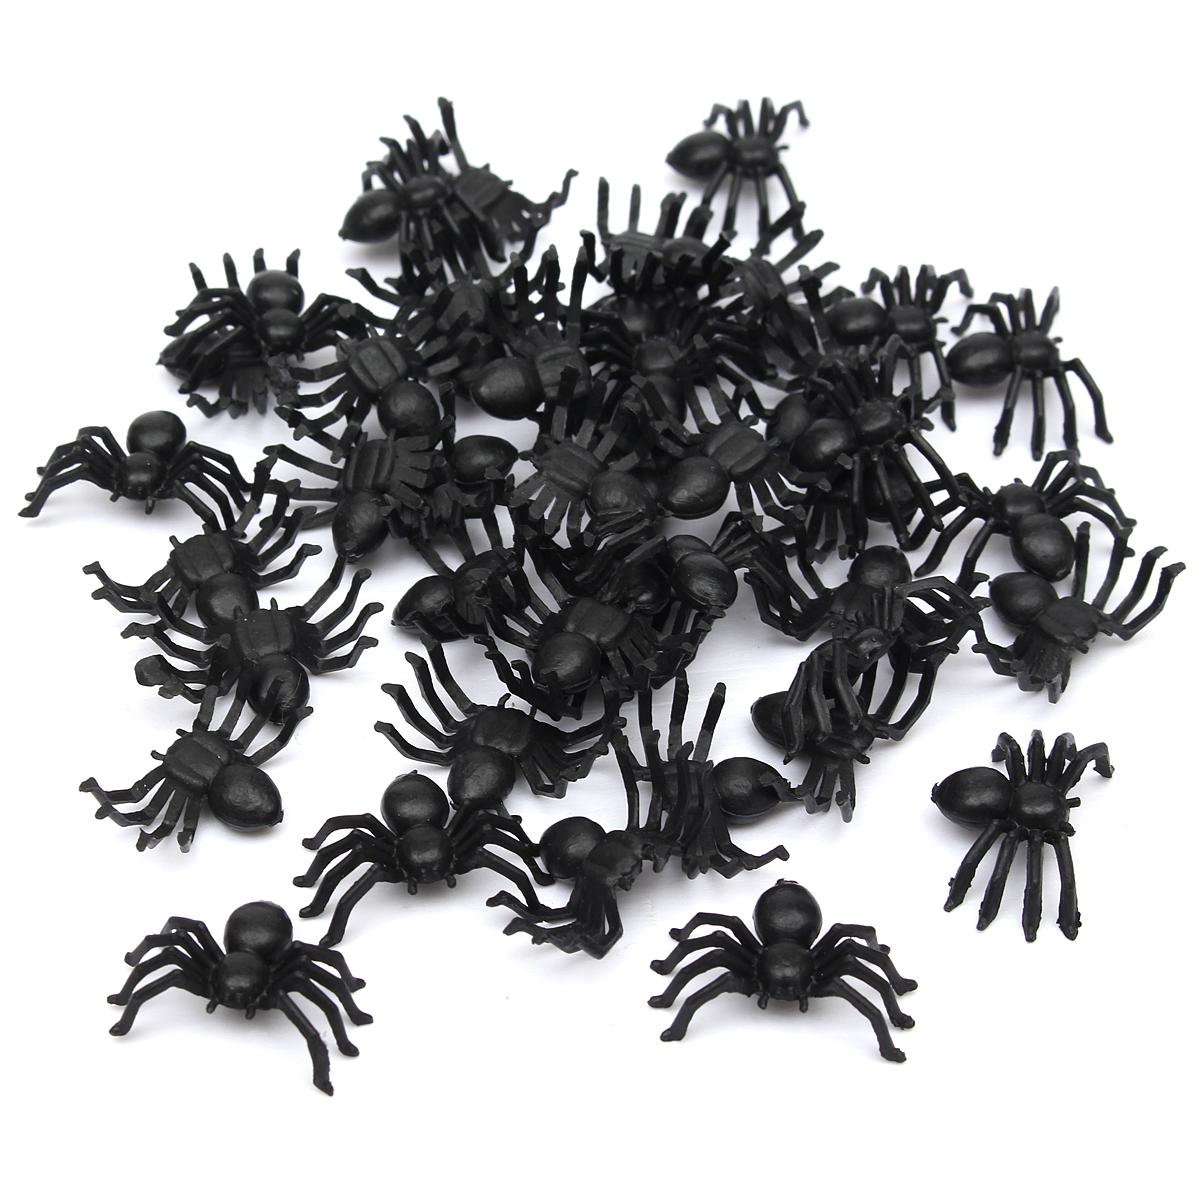 Halloween Party Plastic Cockroaches Spiders Rubber Toys Joke Prop ...